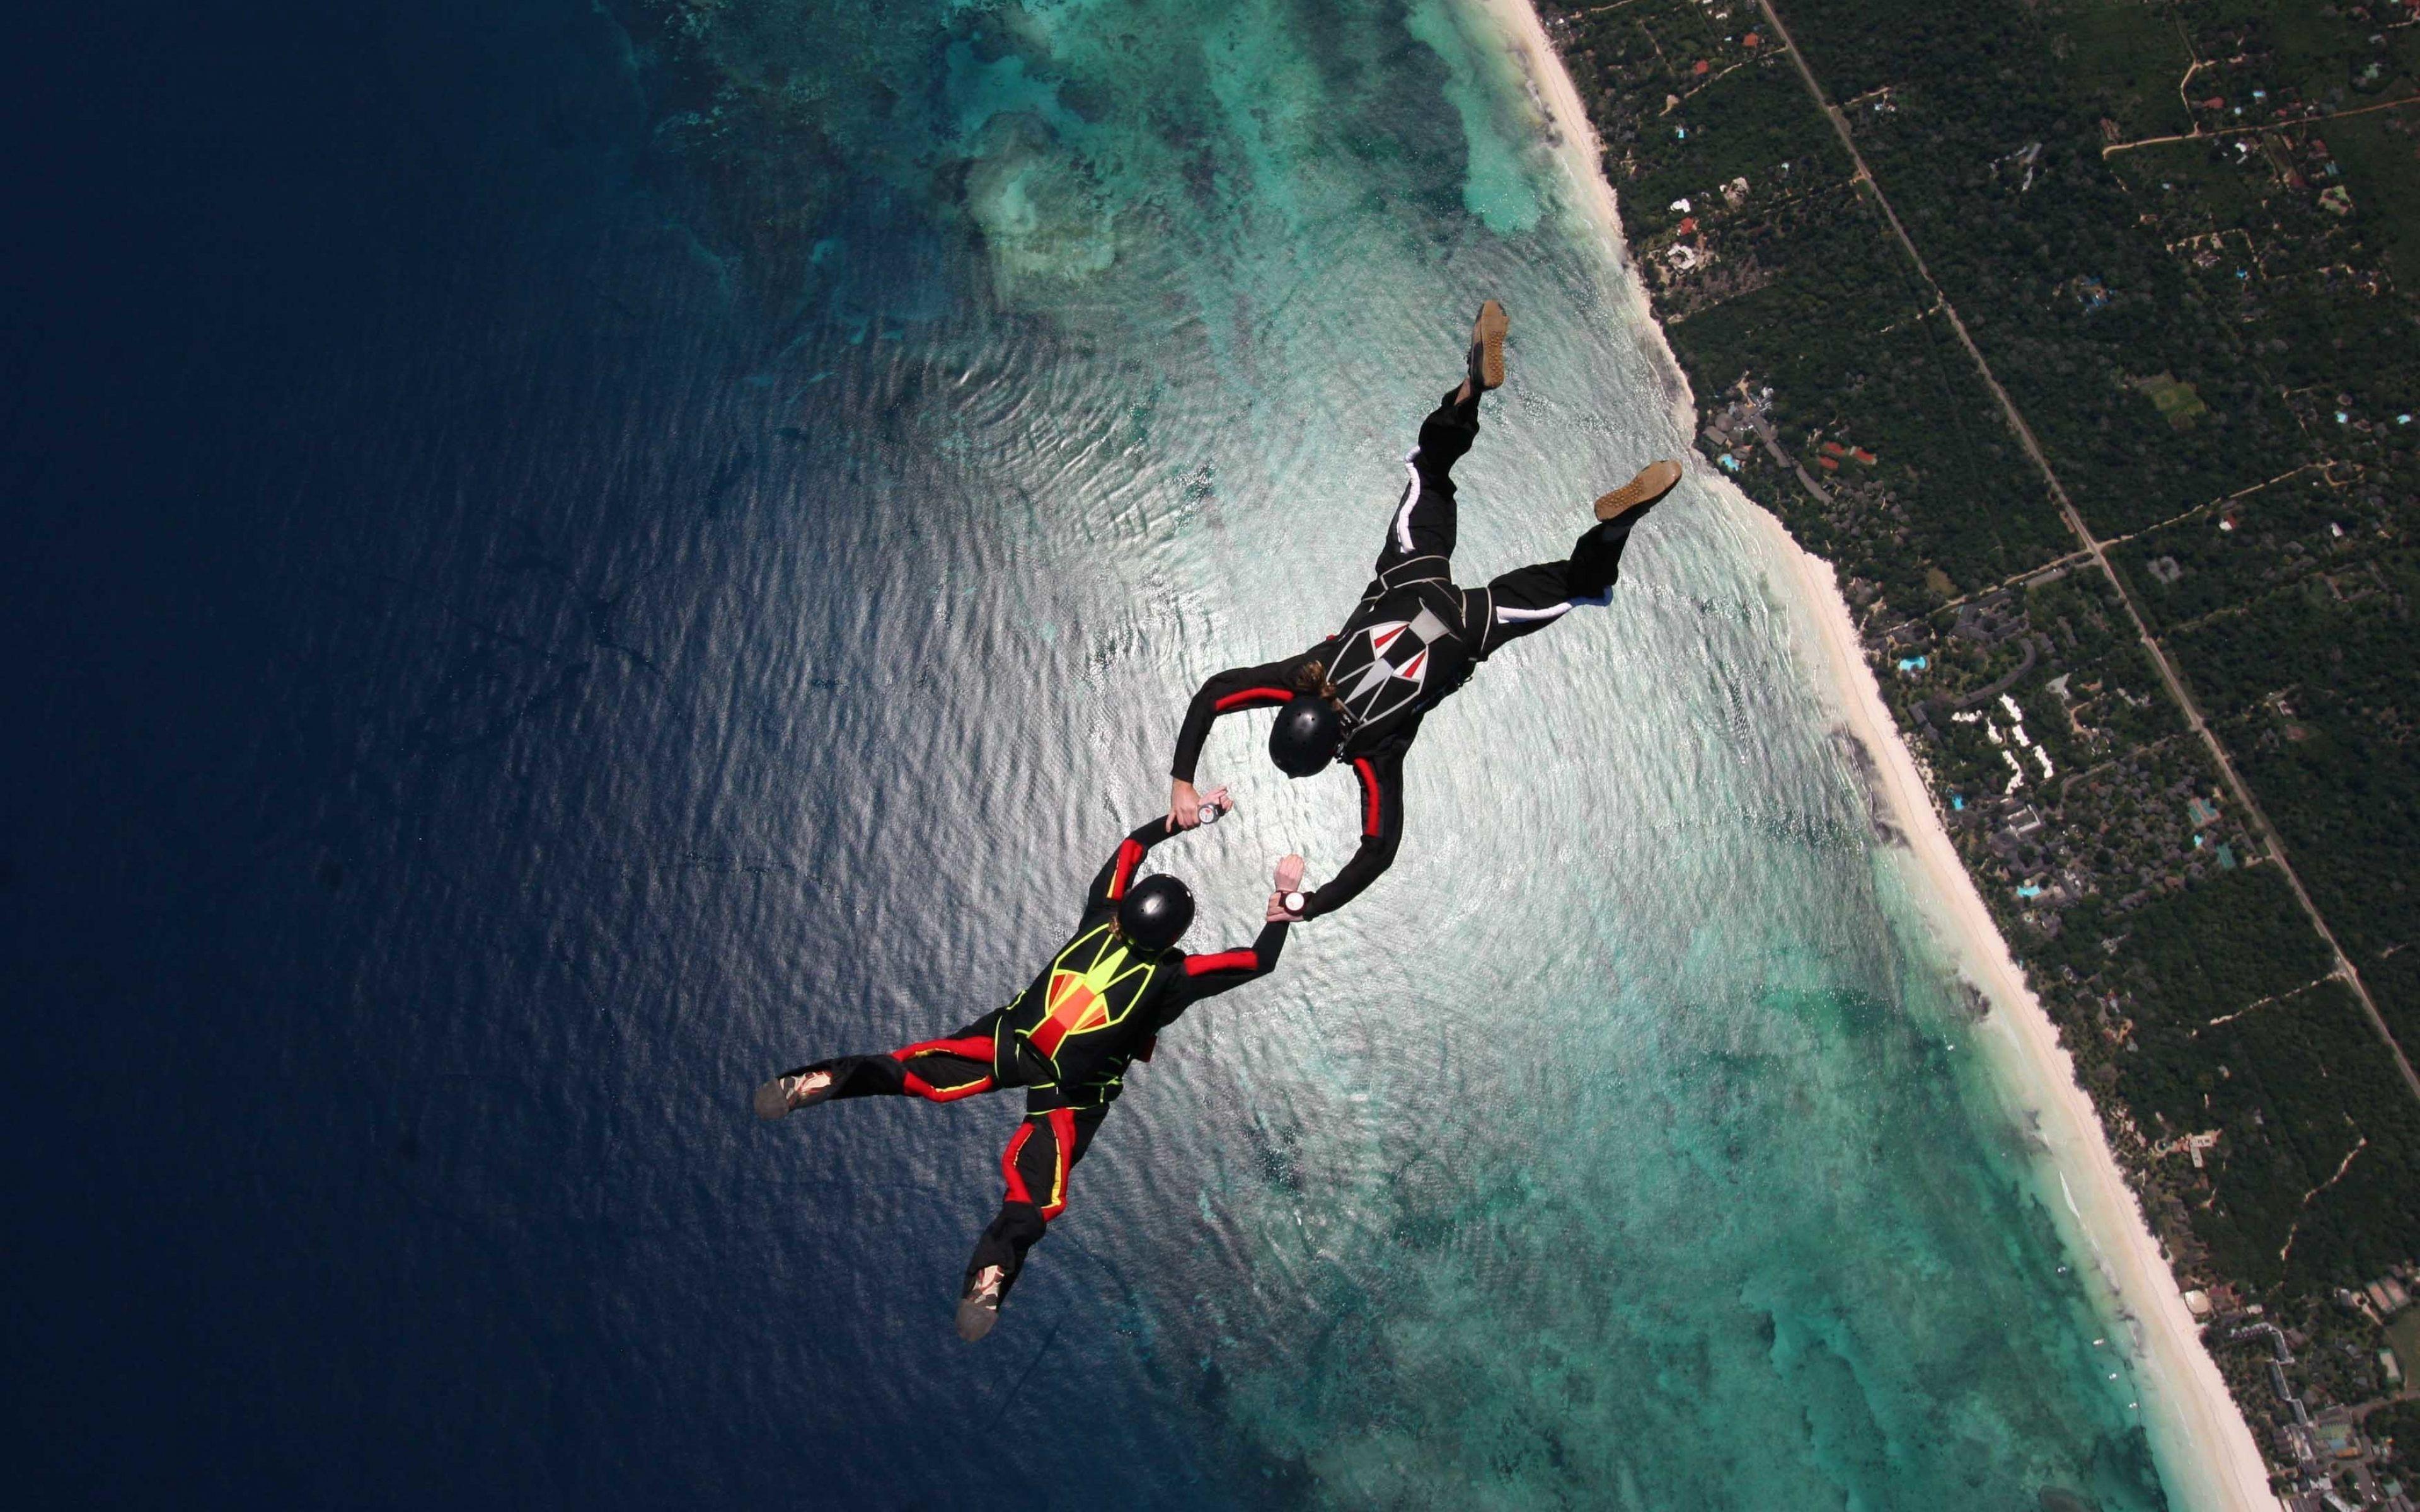 sky diving adventure sports 4k ultra hd wallpaper | ololoshenka